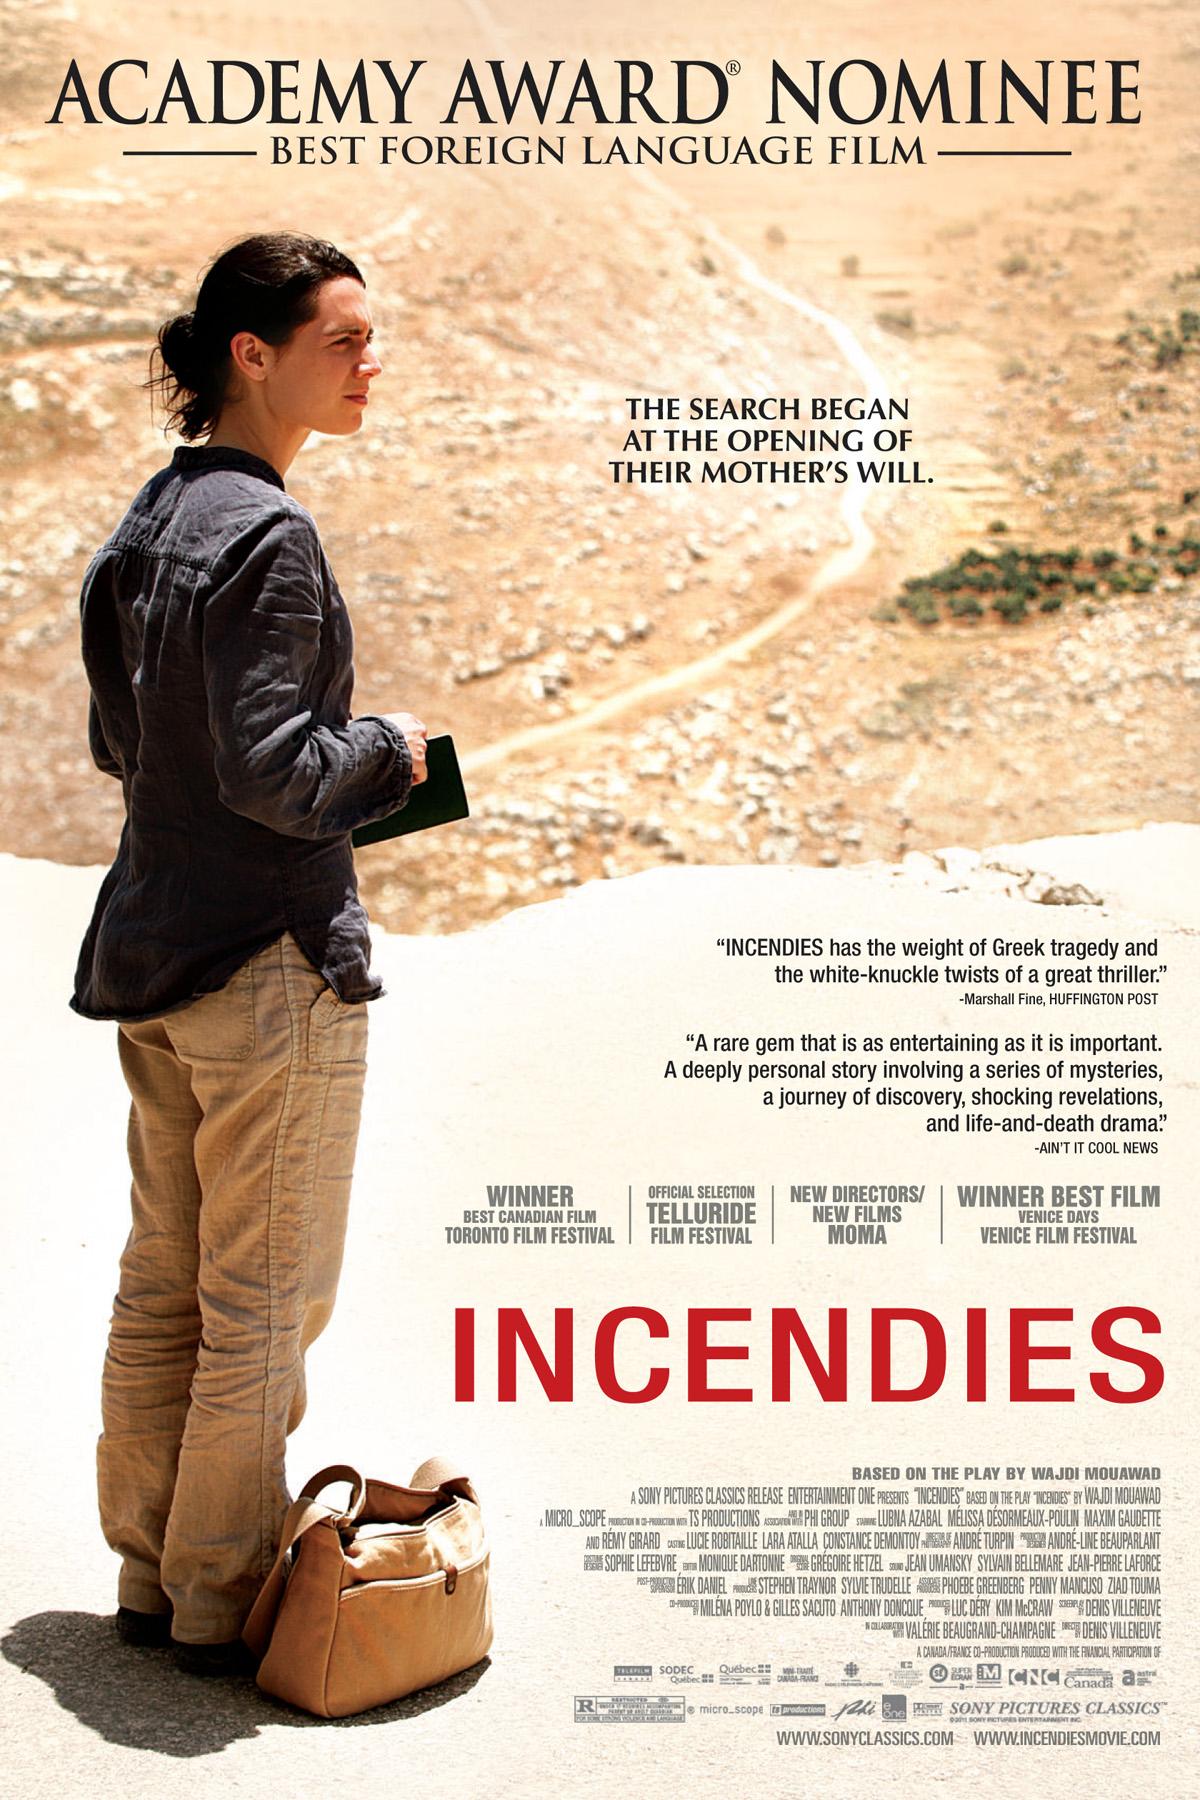 Incendies (2010) - IMDb